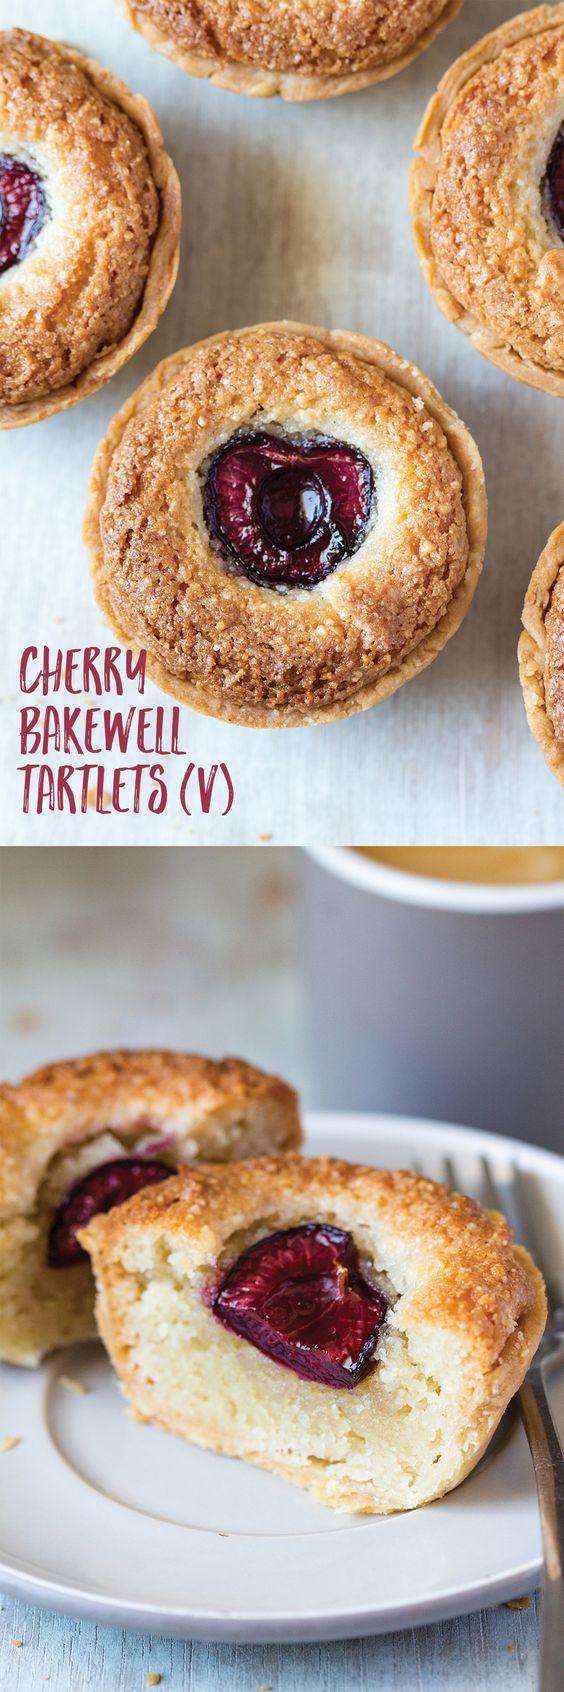 Vegan cherry bakewell tartlets